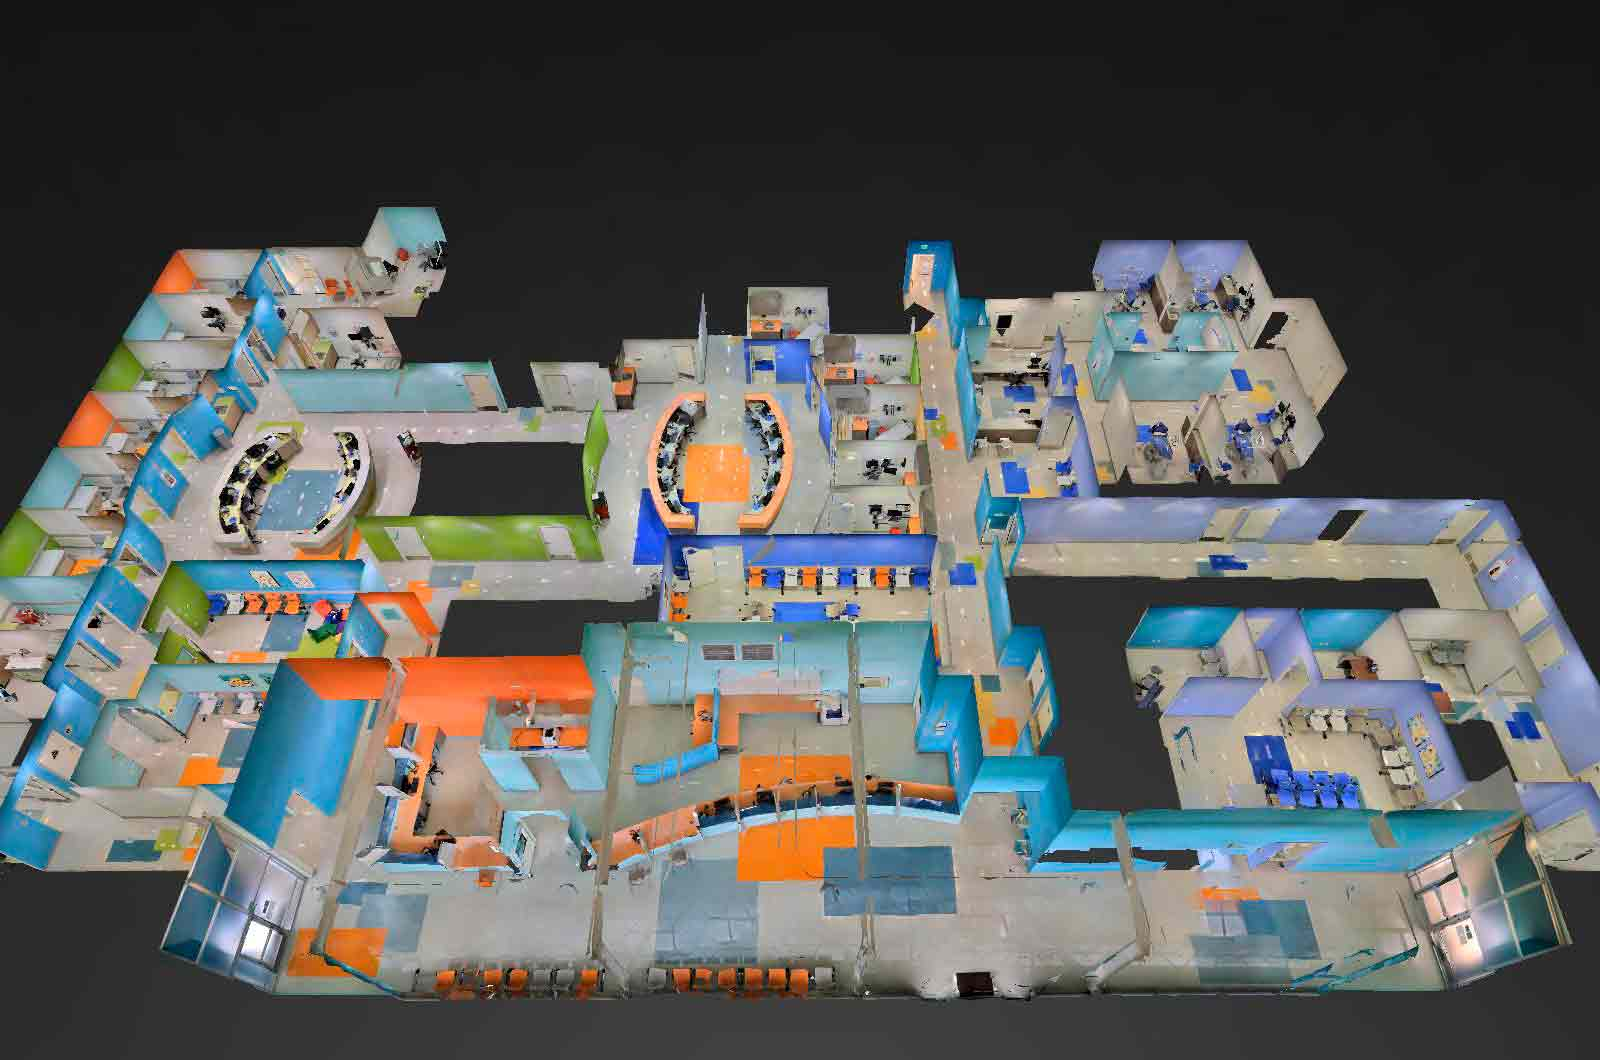 Feat-Image-3D-Tours-Commercial-Real-Estate